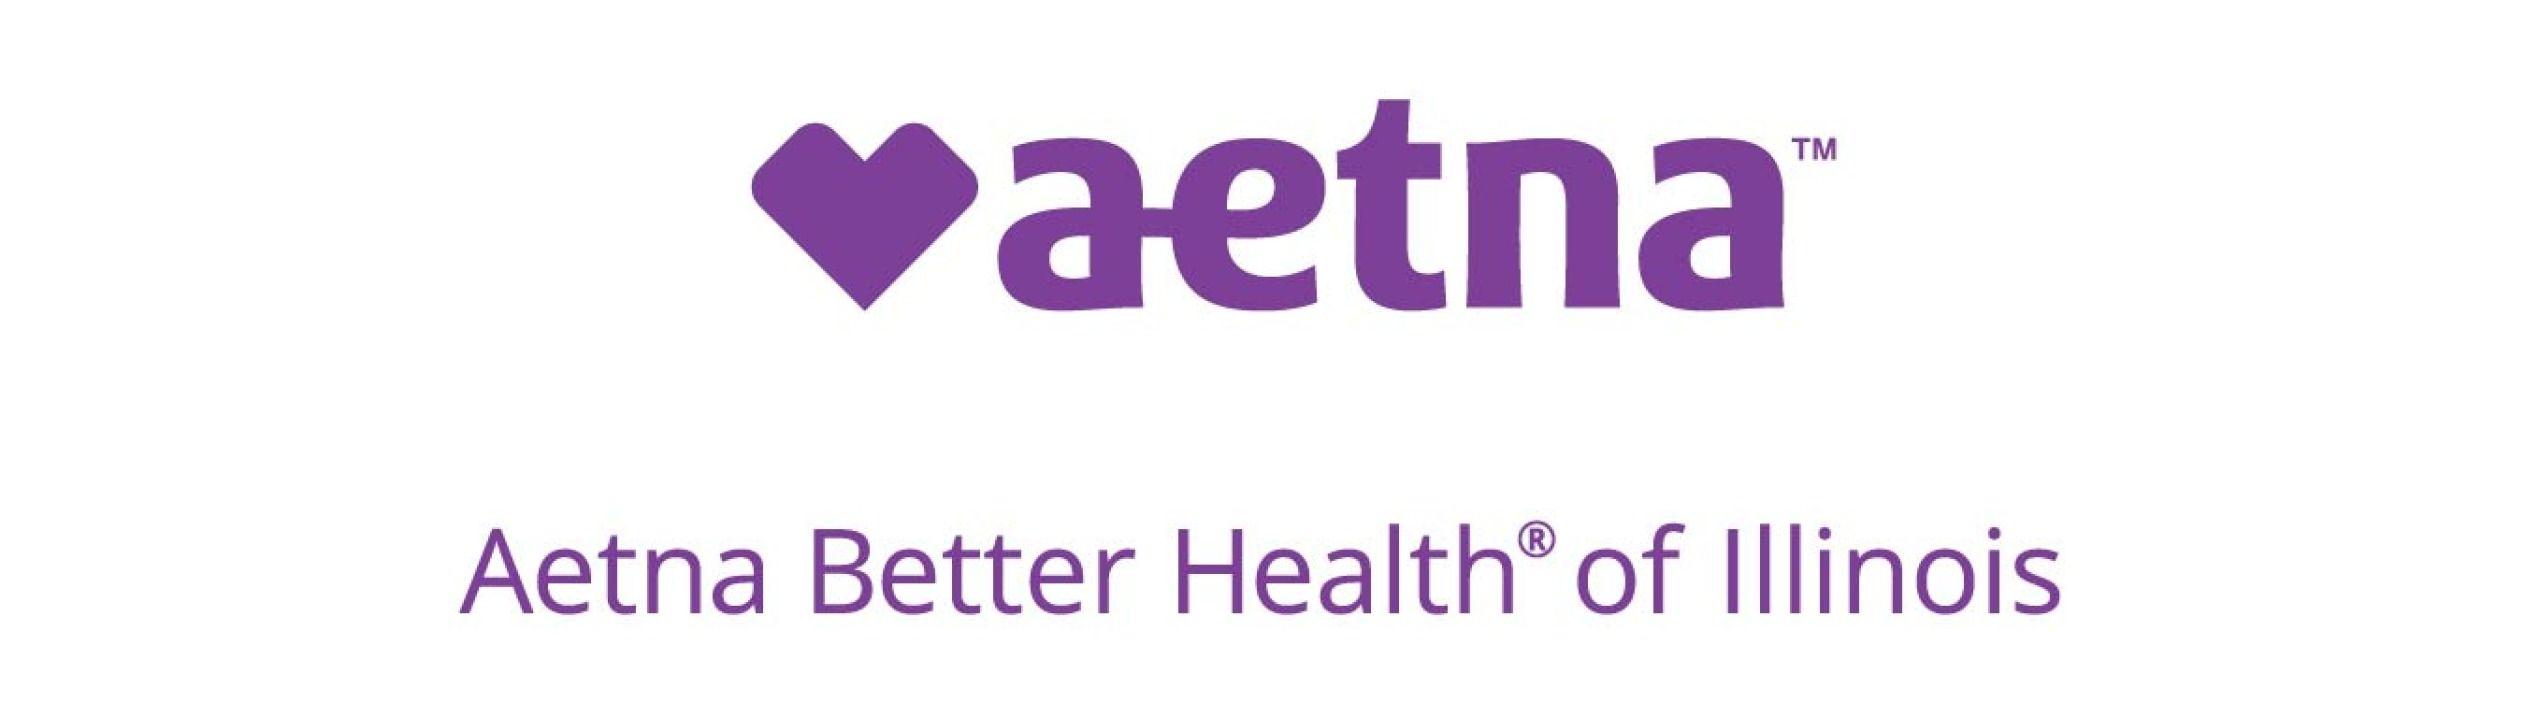 Aetna Better Health of Illinios